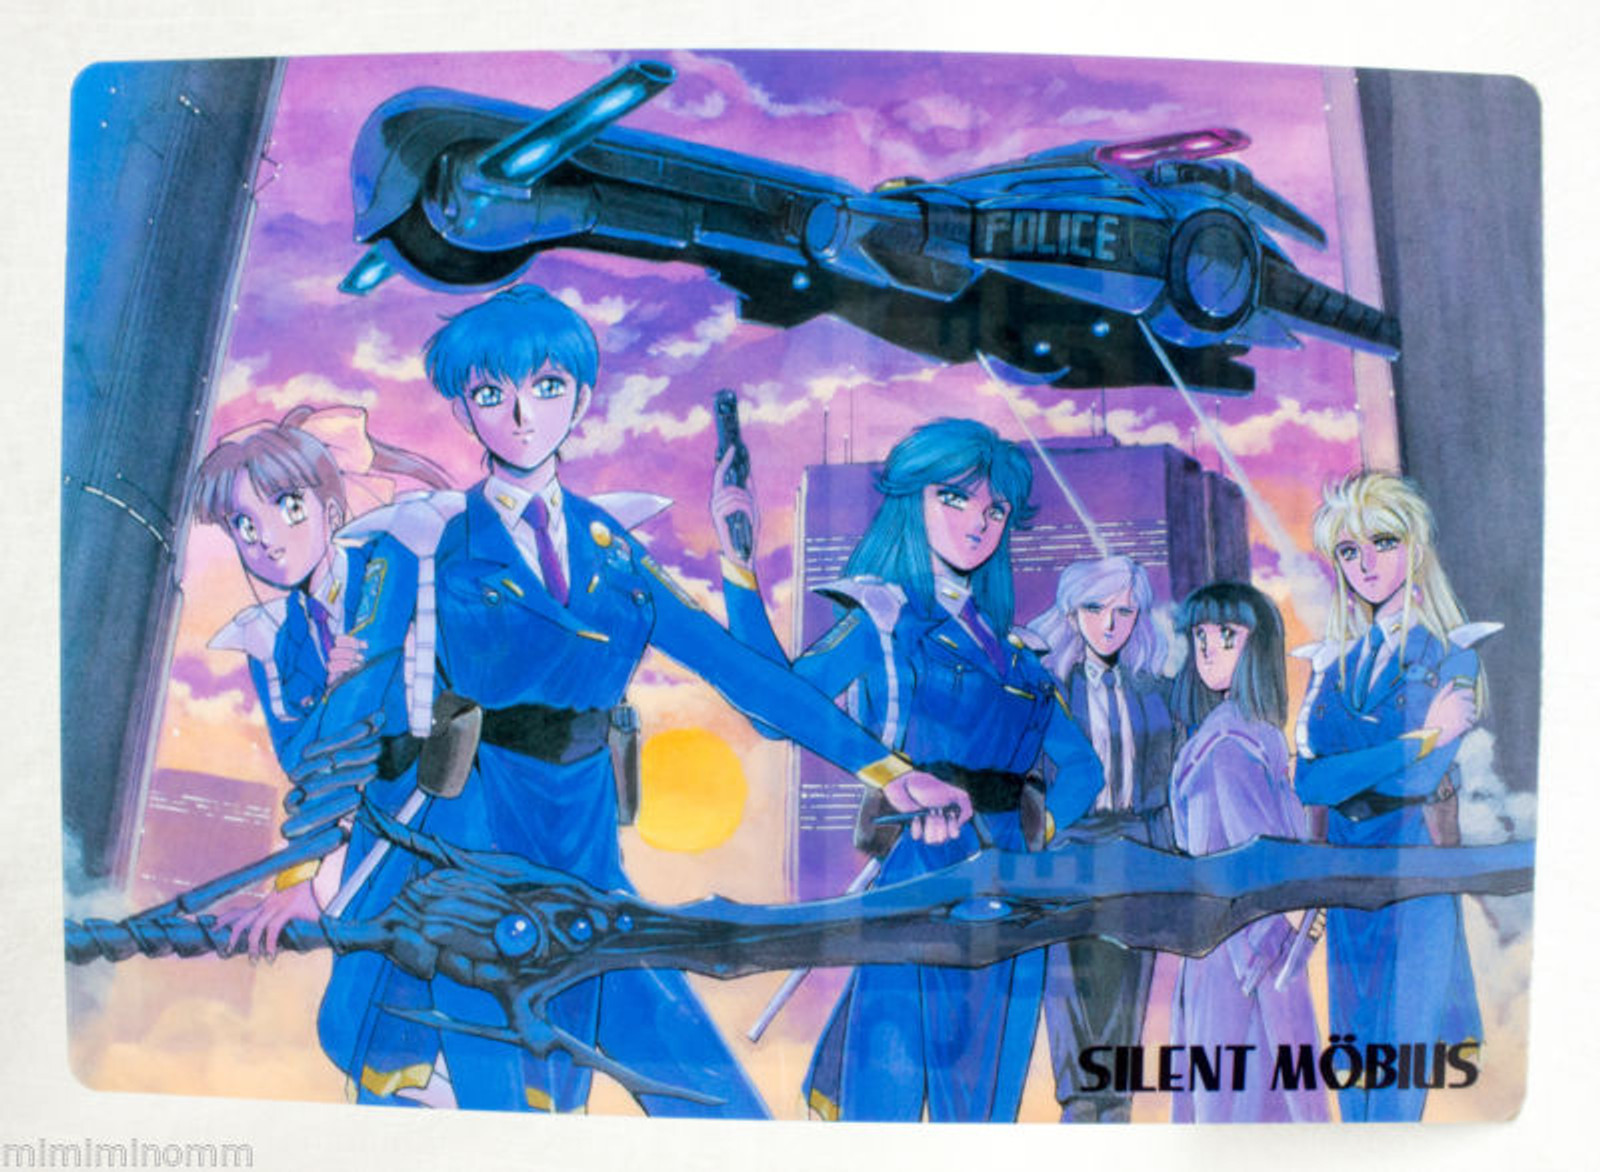 Silent Mobius Plastic Pencil Board Pad JAPAN ANIME MANGA 2